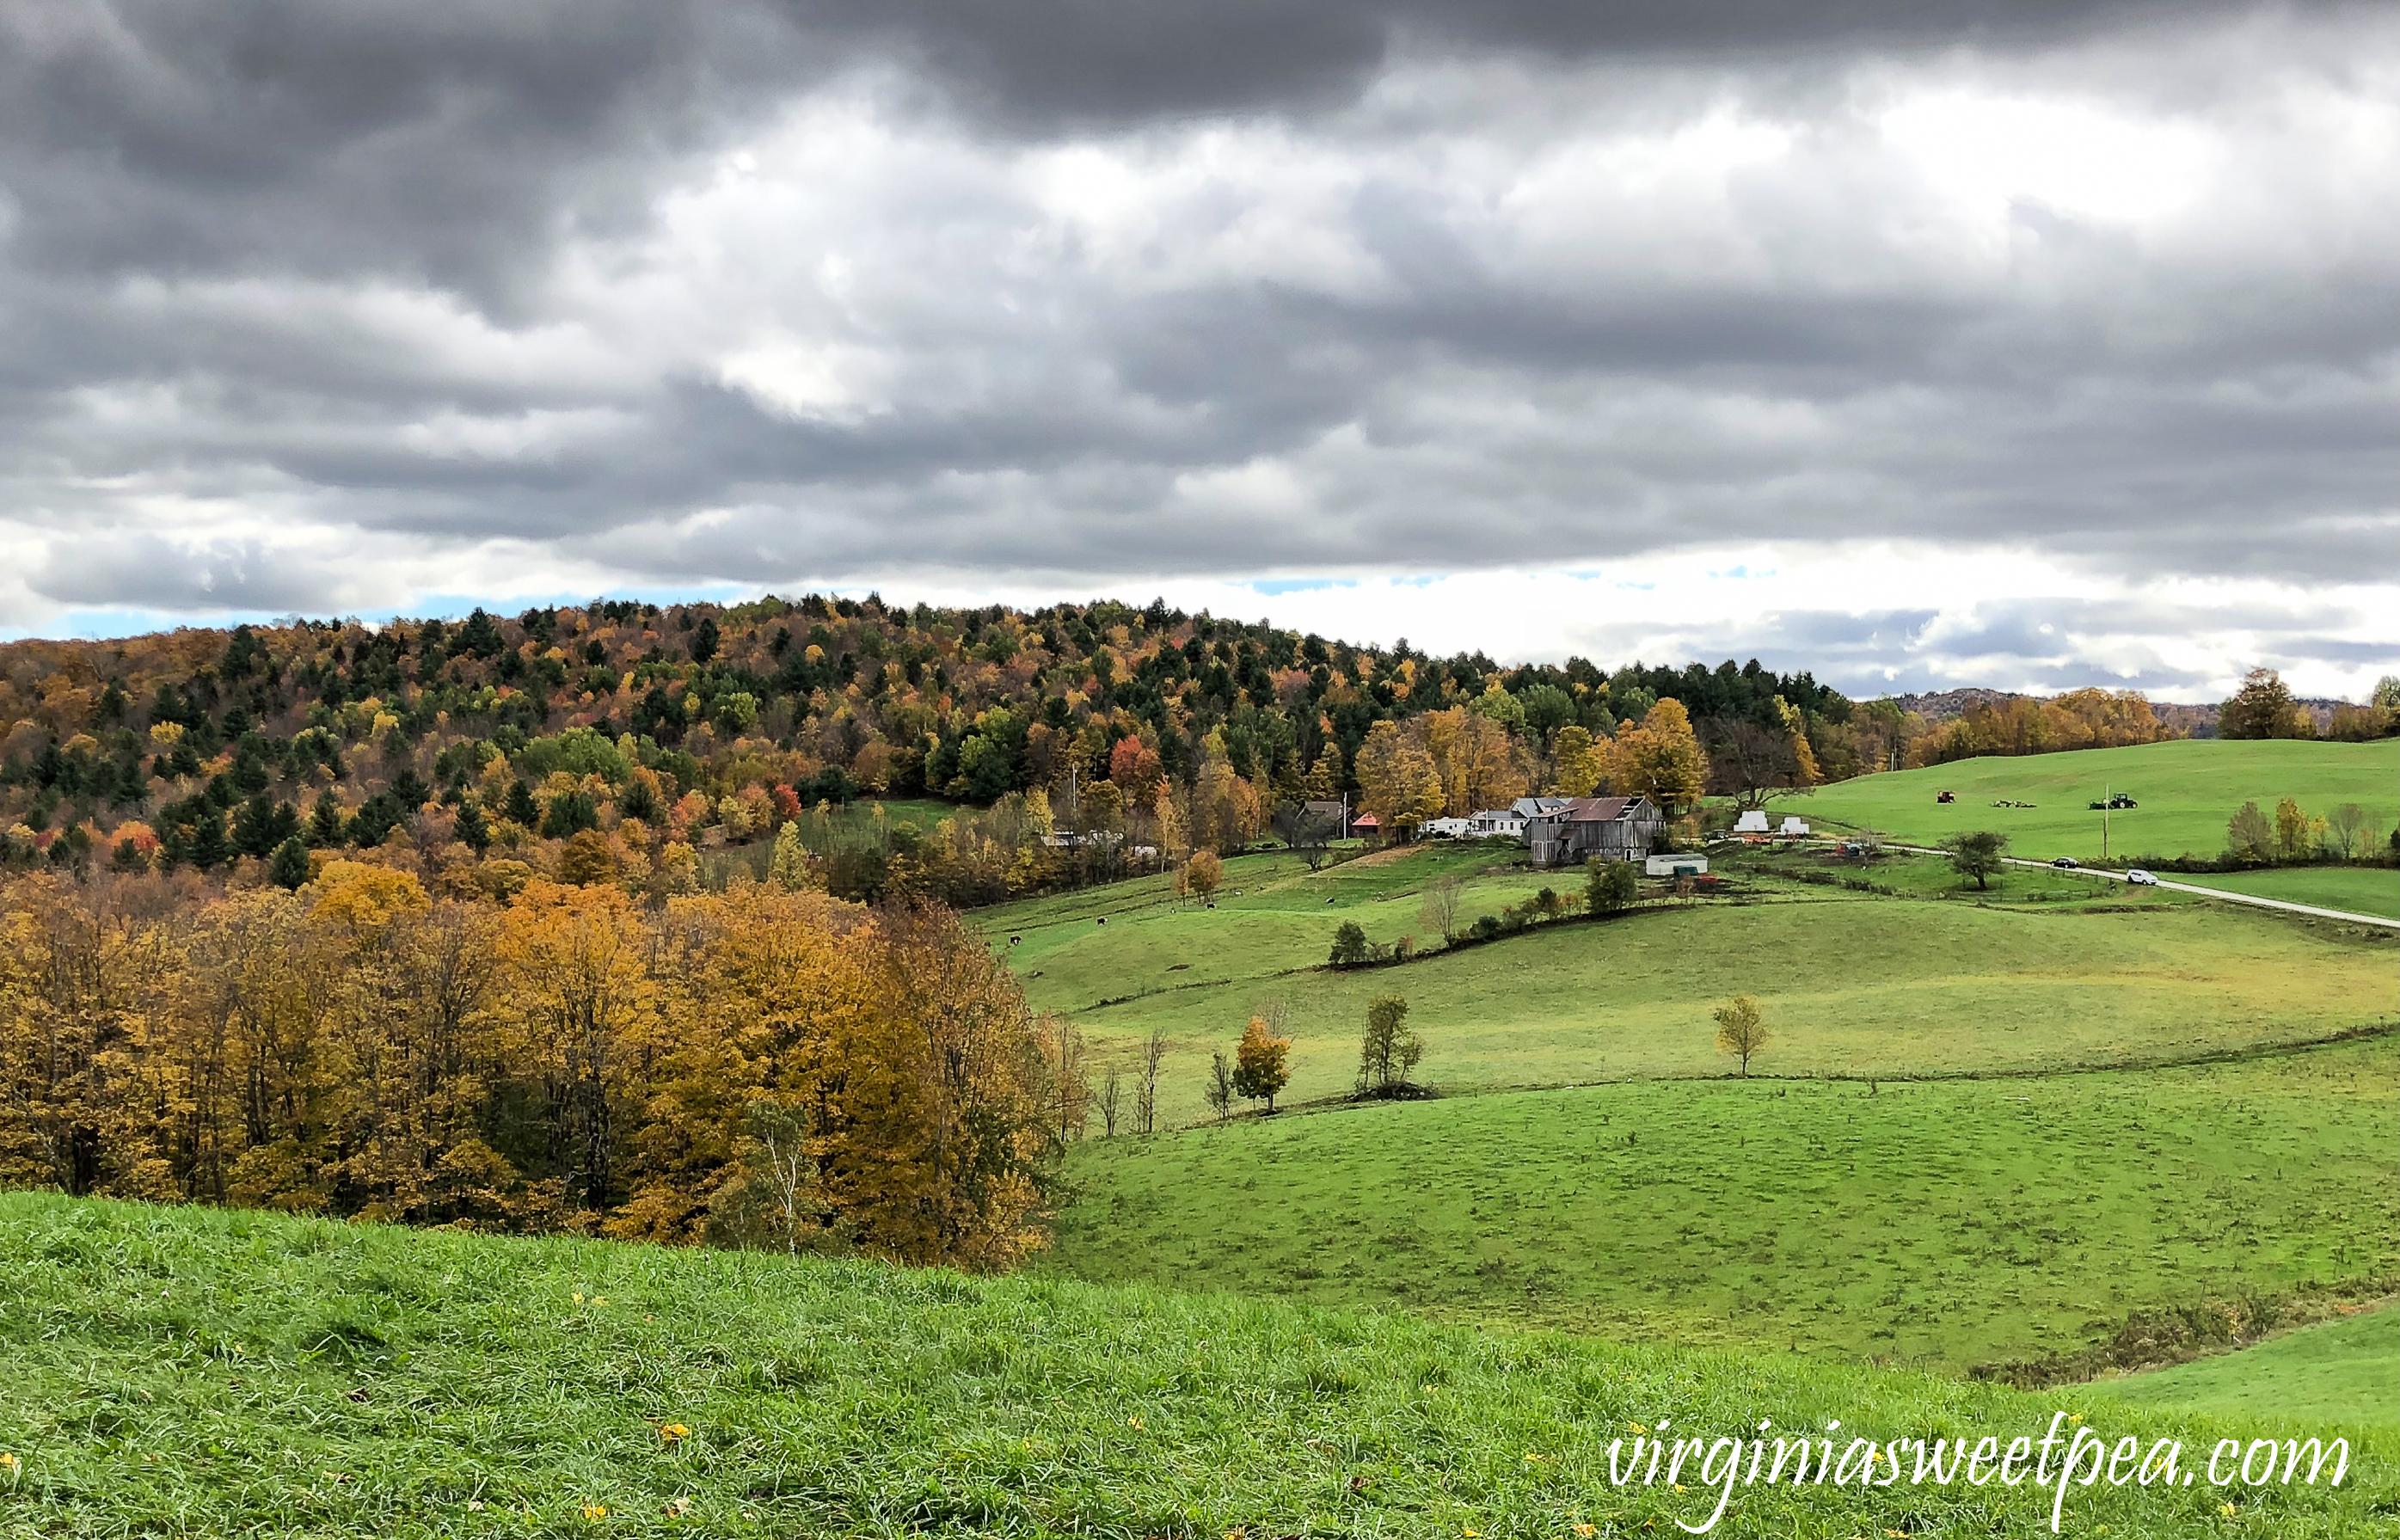 Leaf peeping in Vermont - A trip recap #vermont #fallinvermont #woodstockvermont #travel